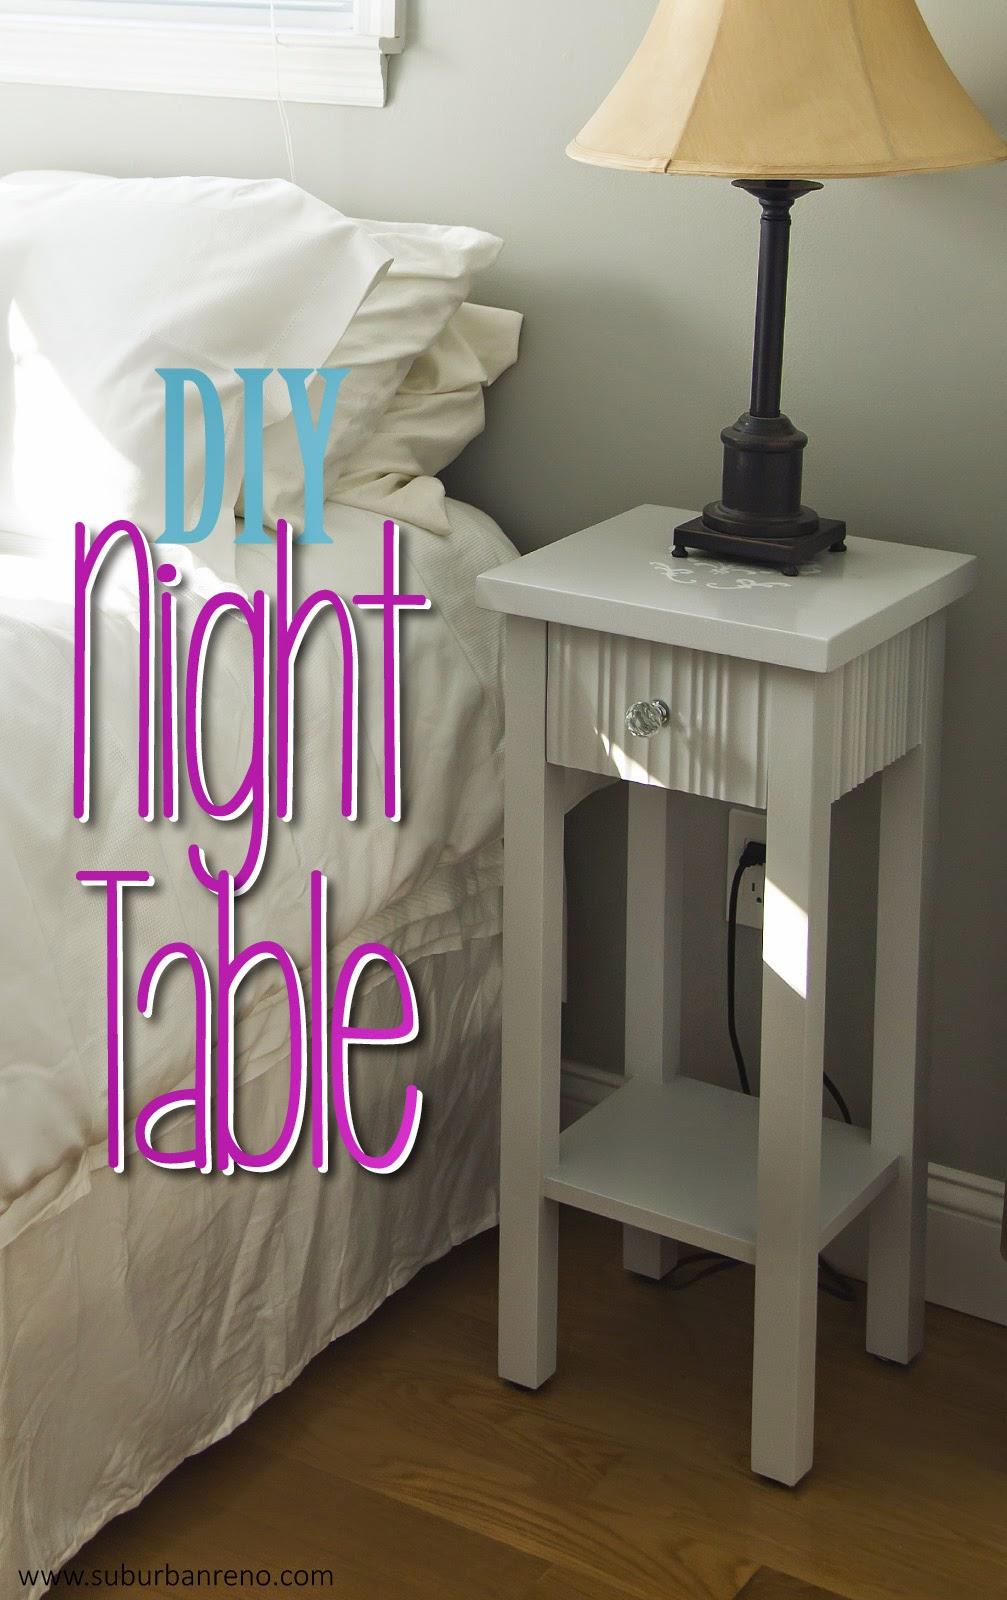 DIY Night Table